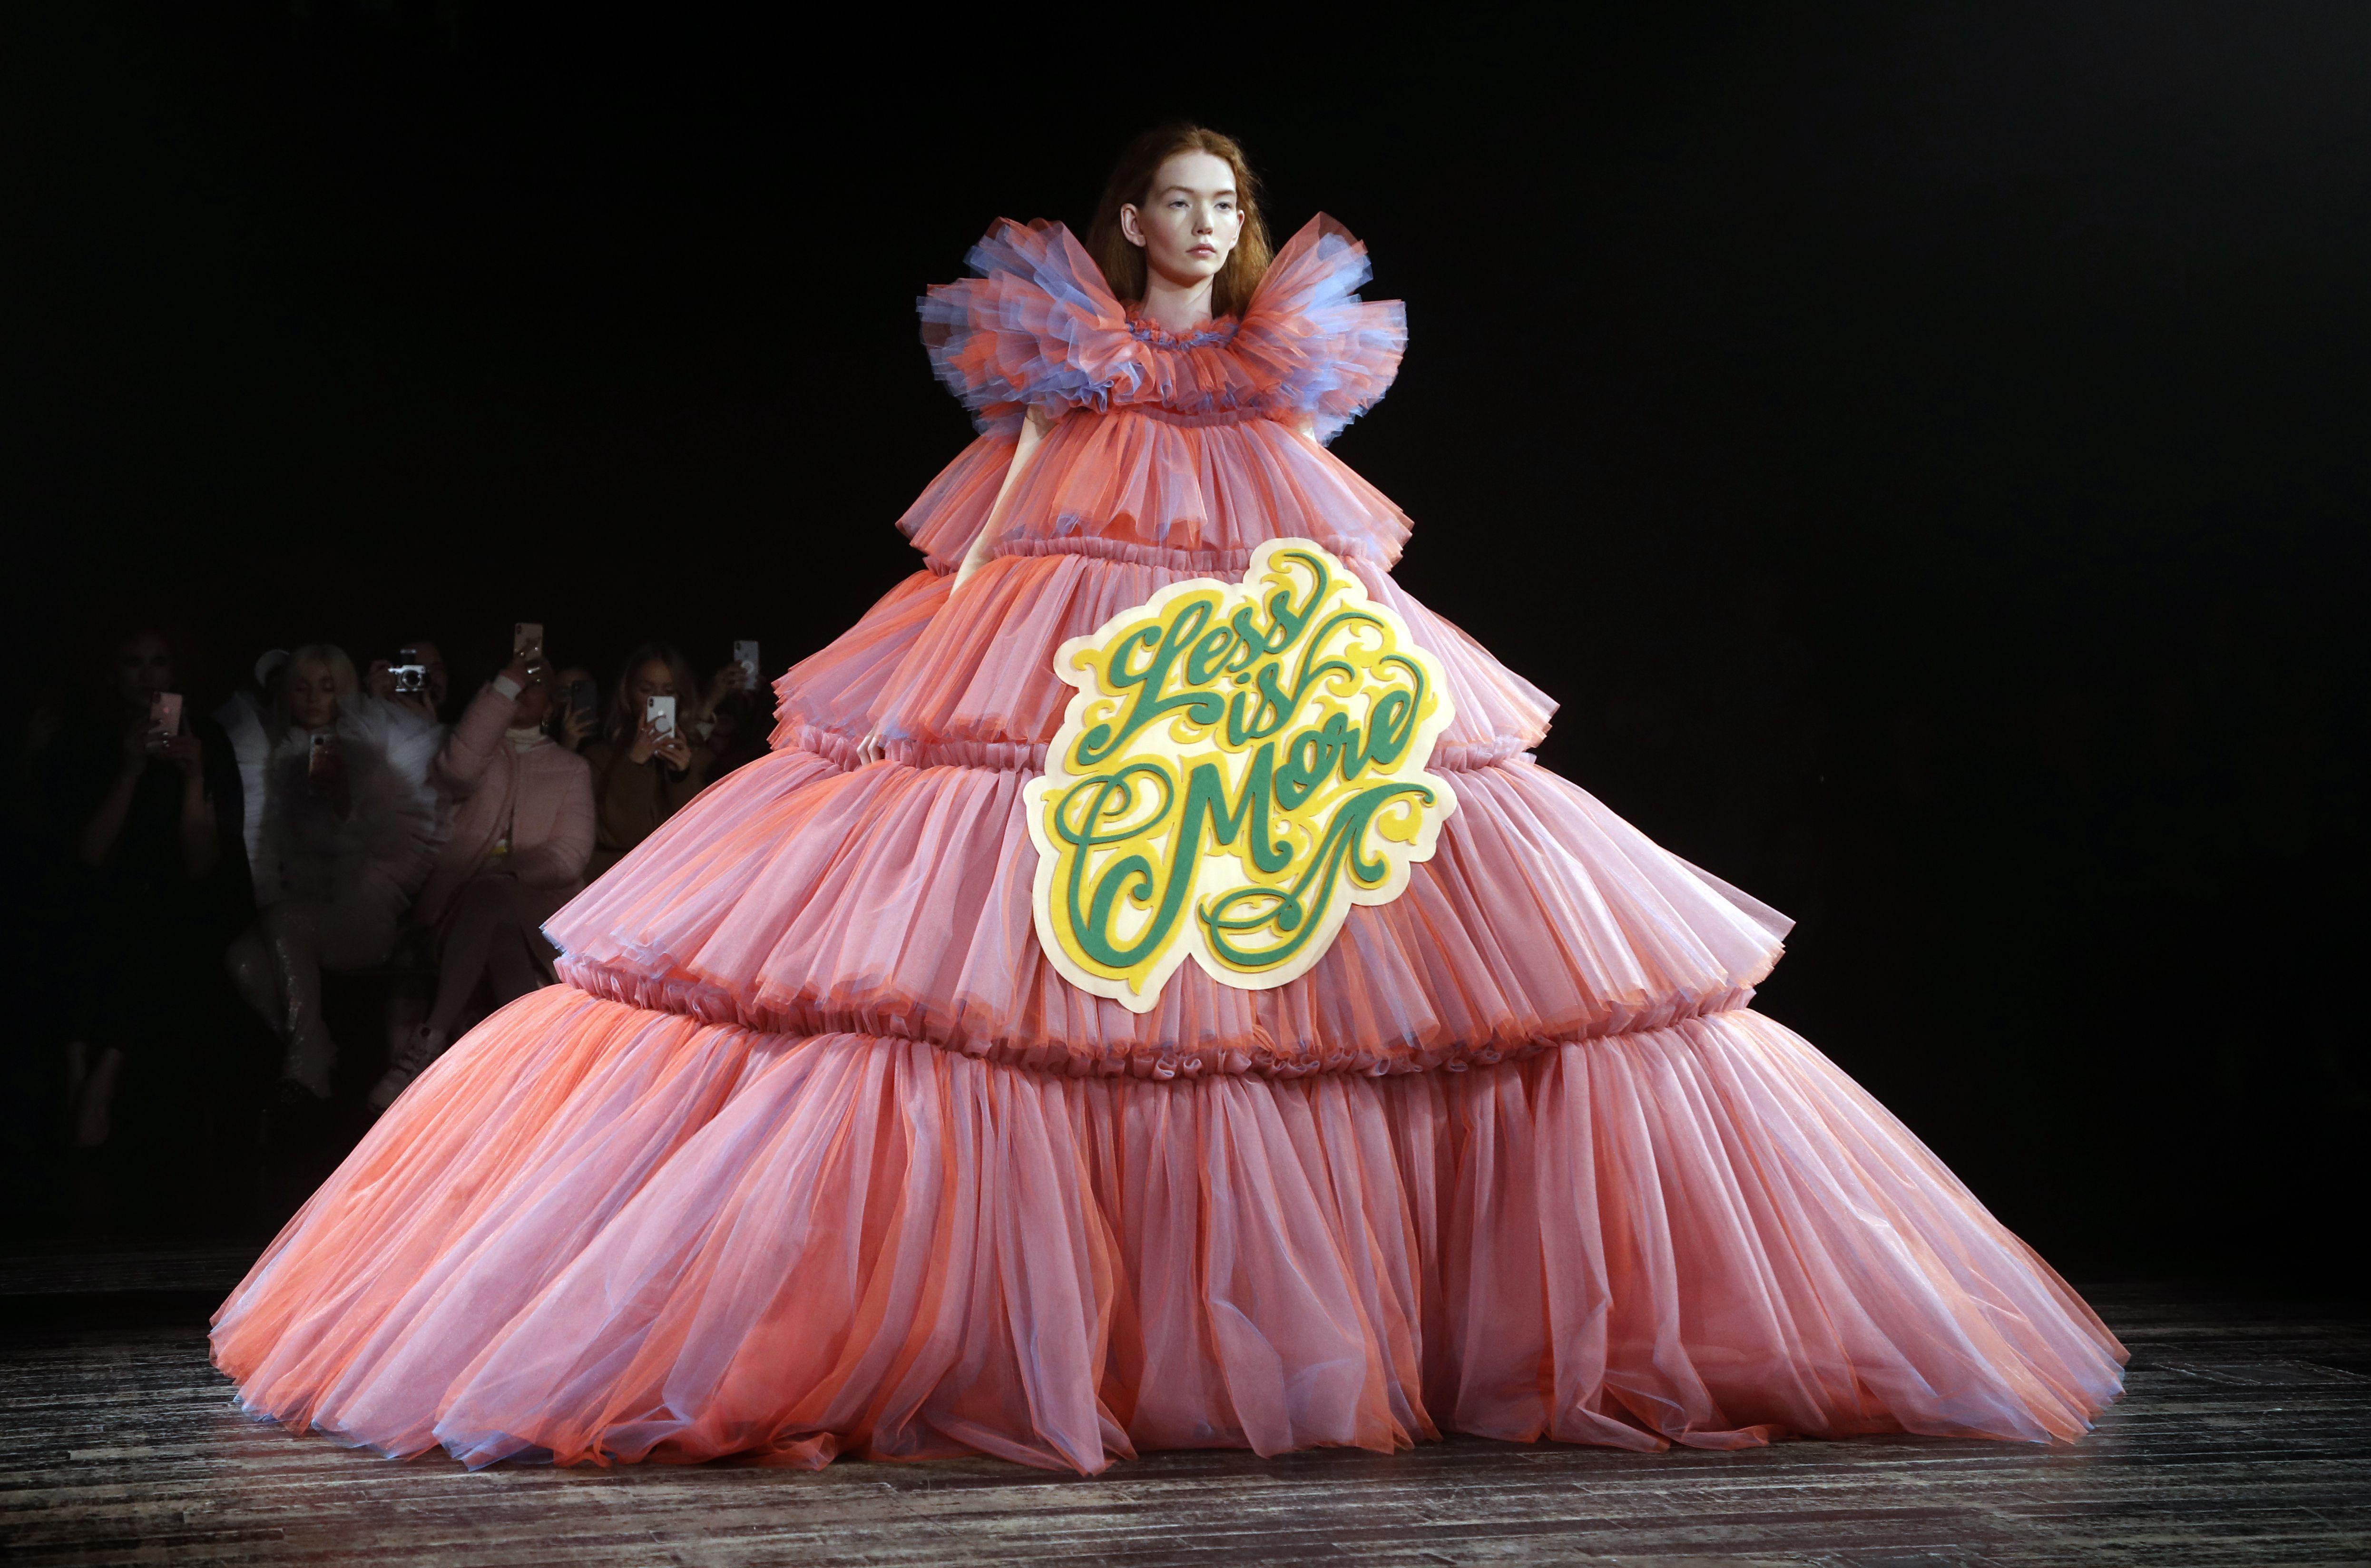 Viktor & Rolf Couture Meme Dress Met Gala 2019